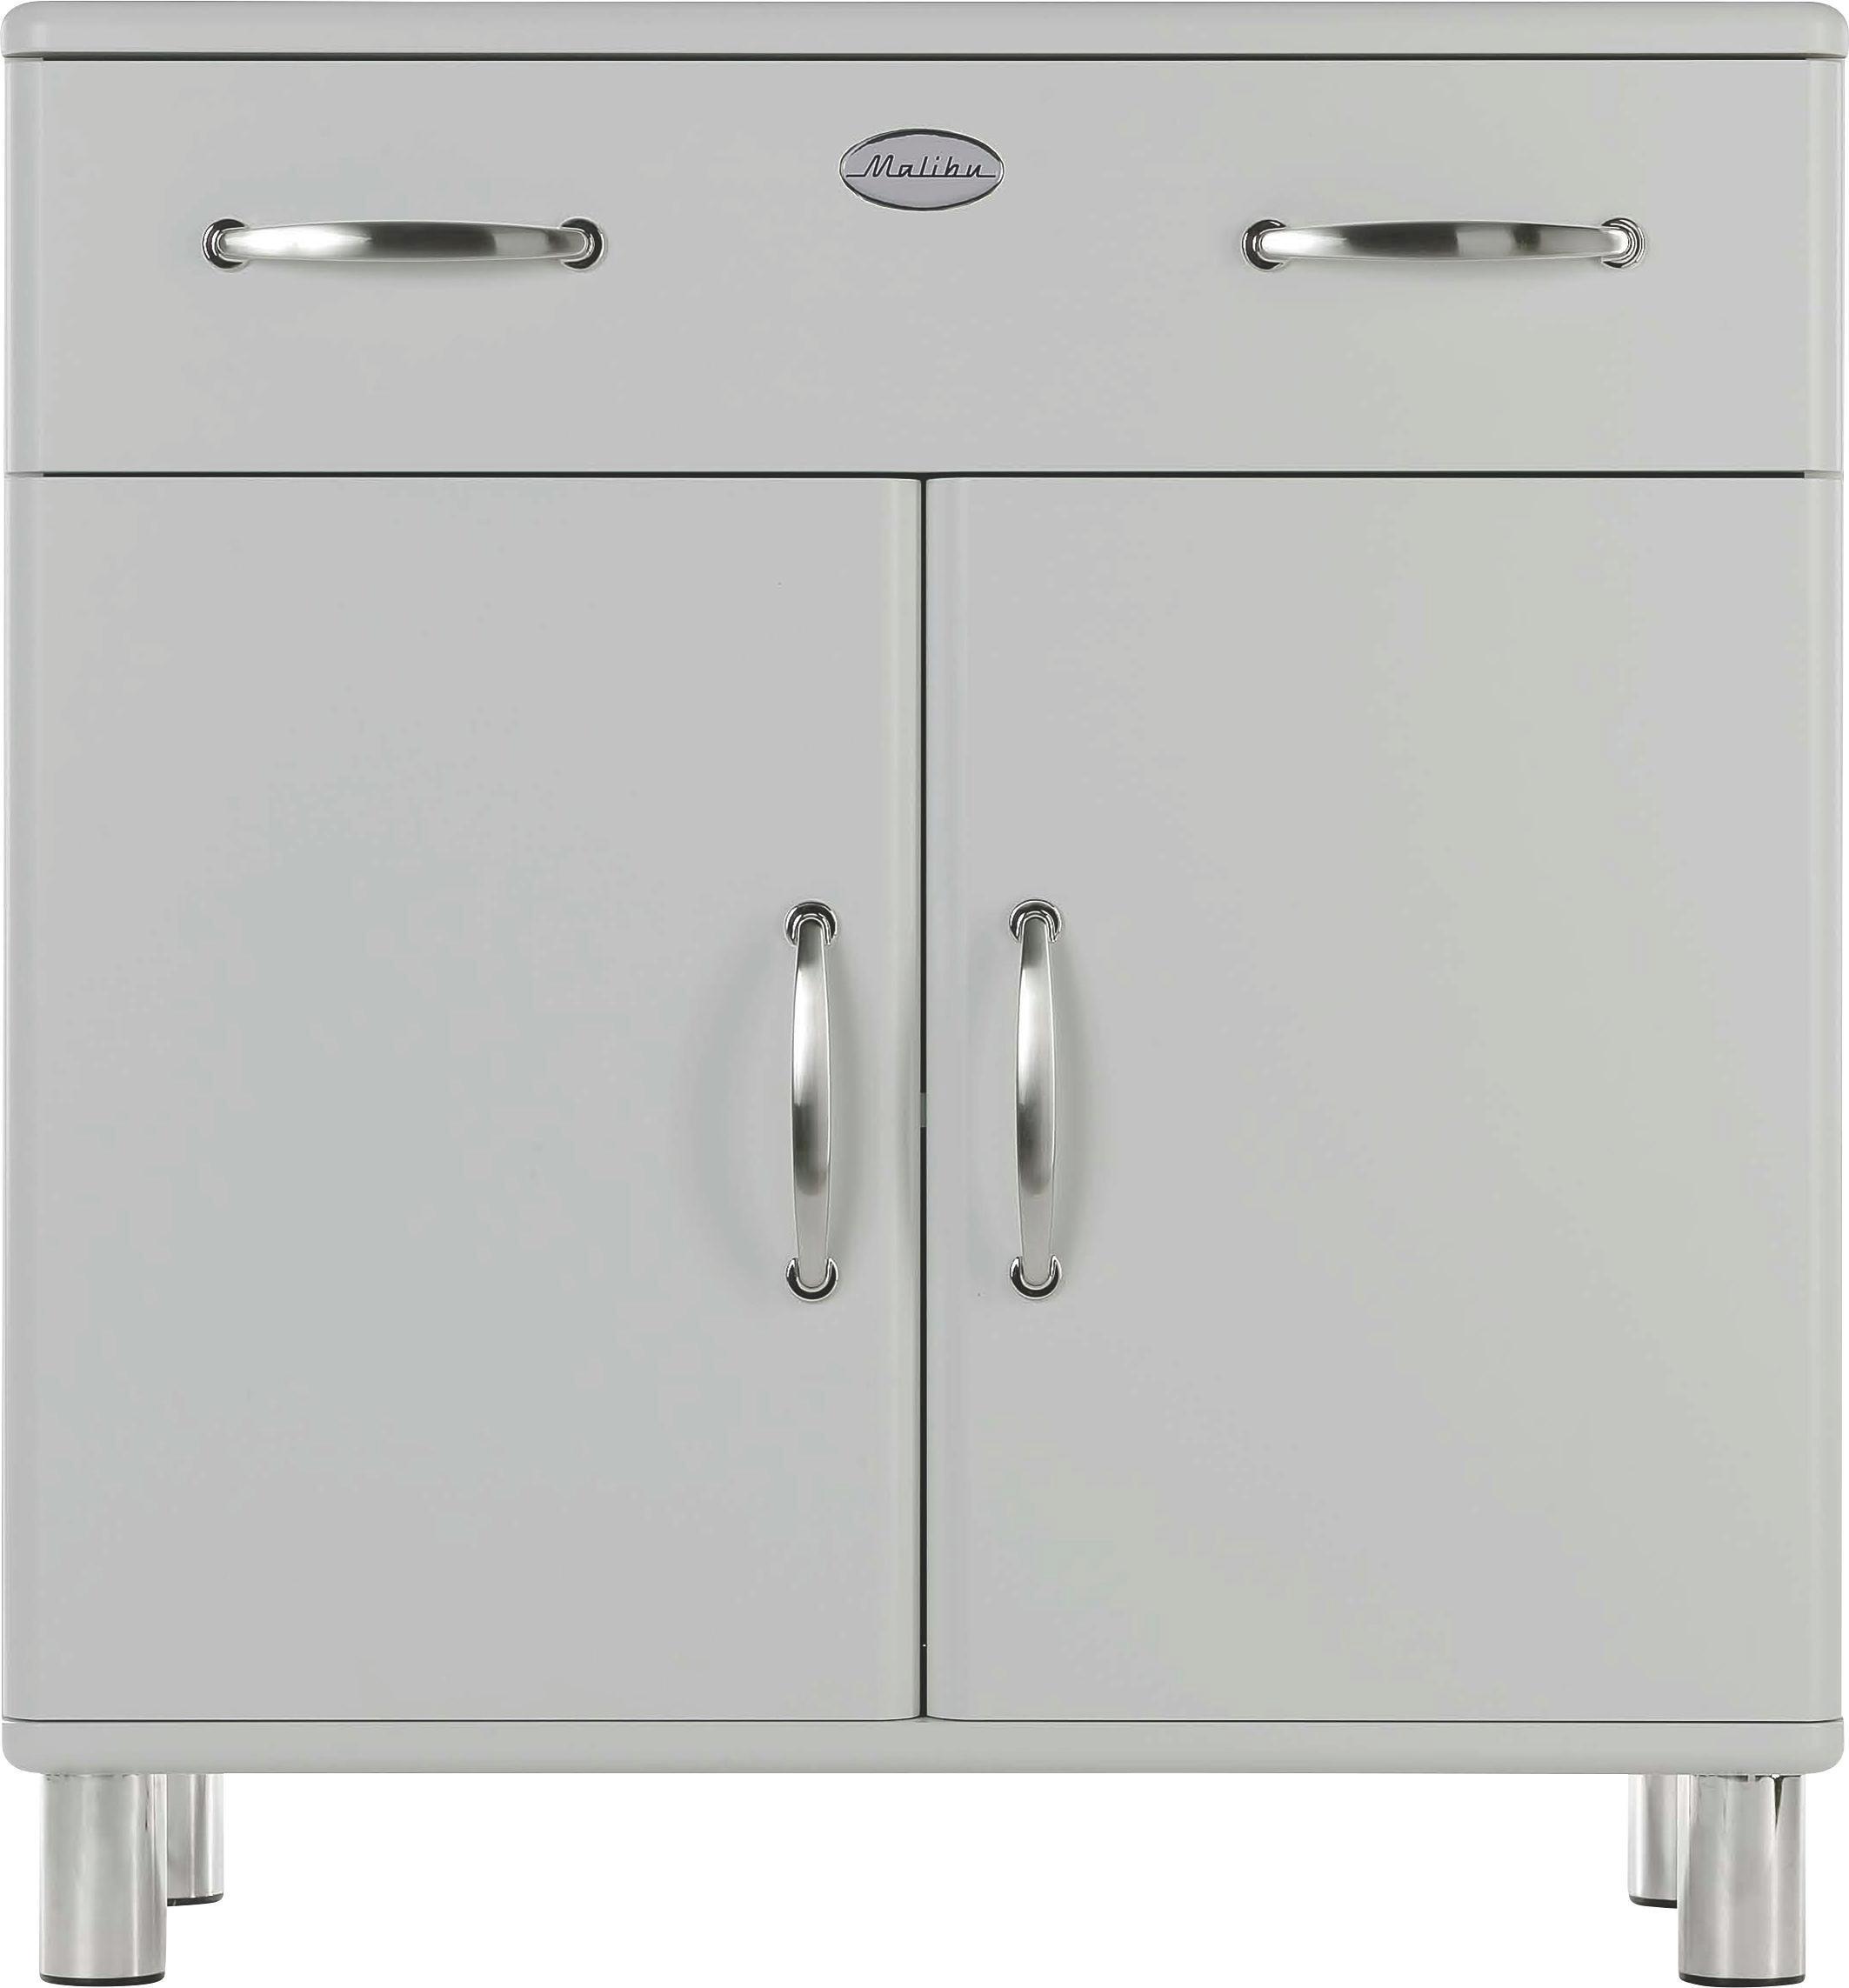 KOMMODE Silberfarben - Silberfarben/Nickelfarben, MODERN, Holzwerkstoff/Metall (86/92/41cm) - CARRYHOME